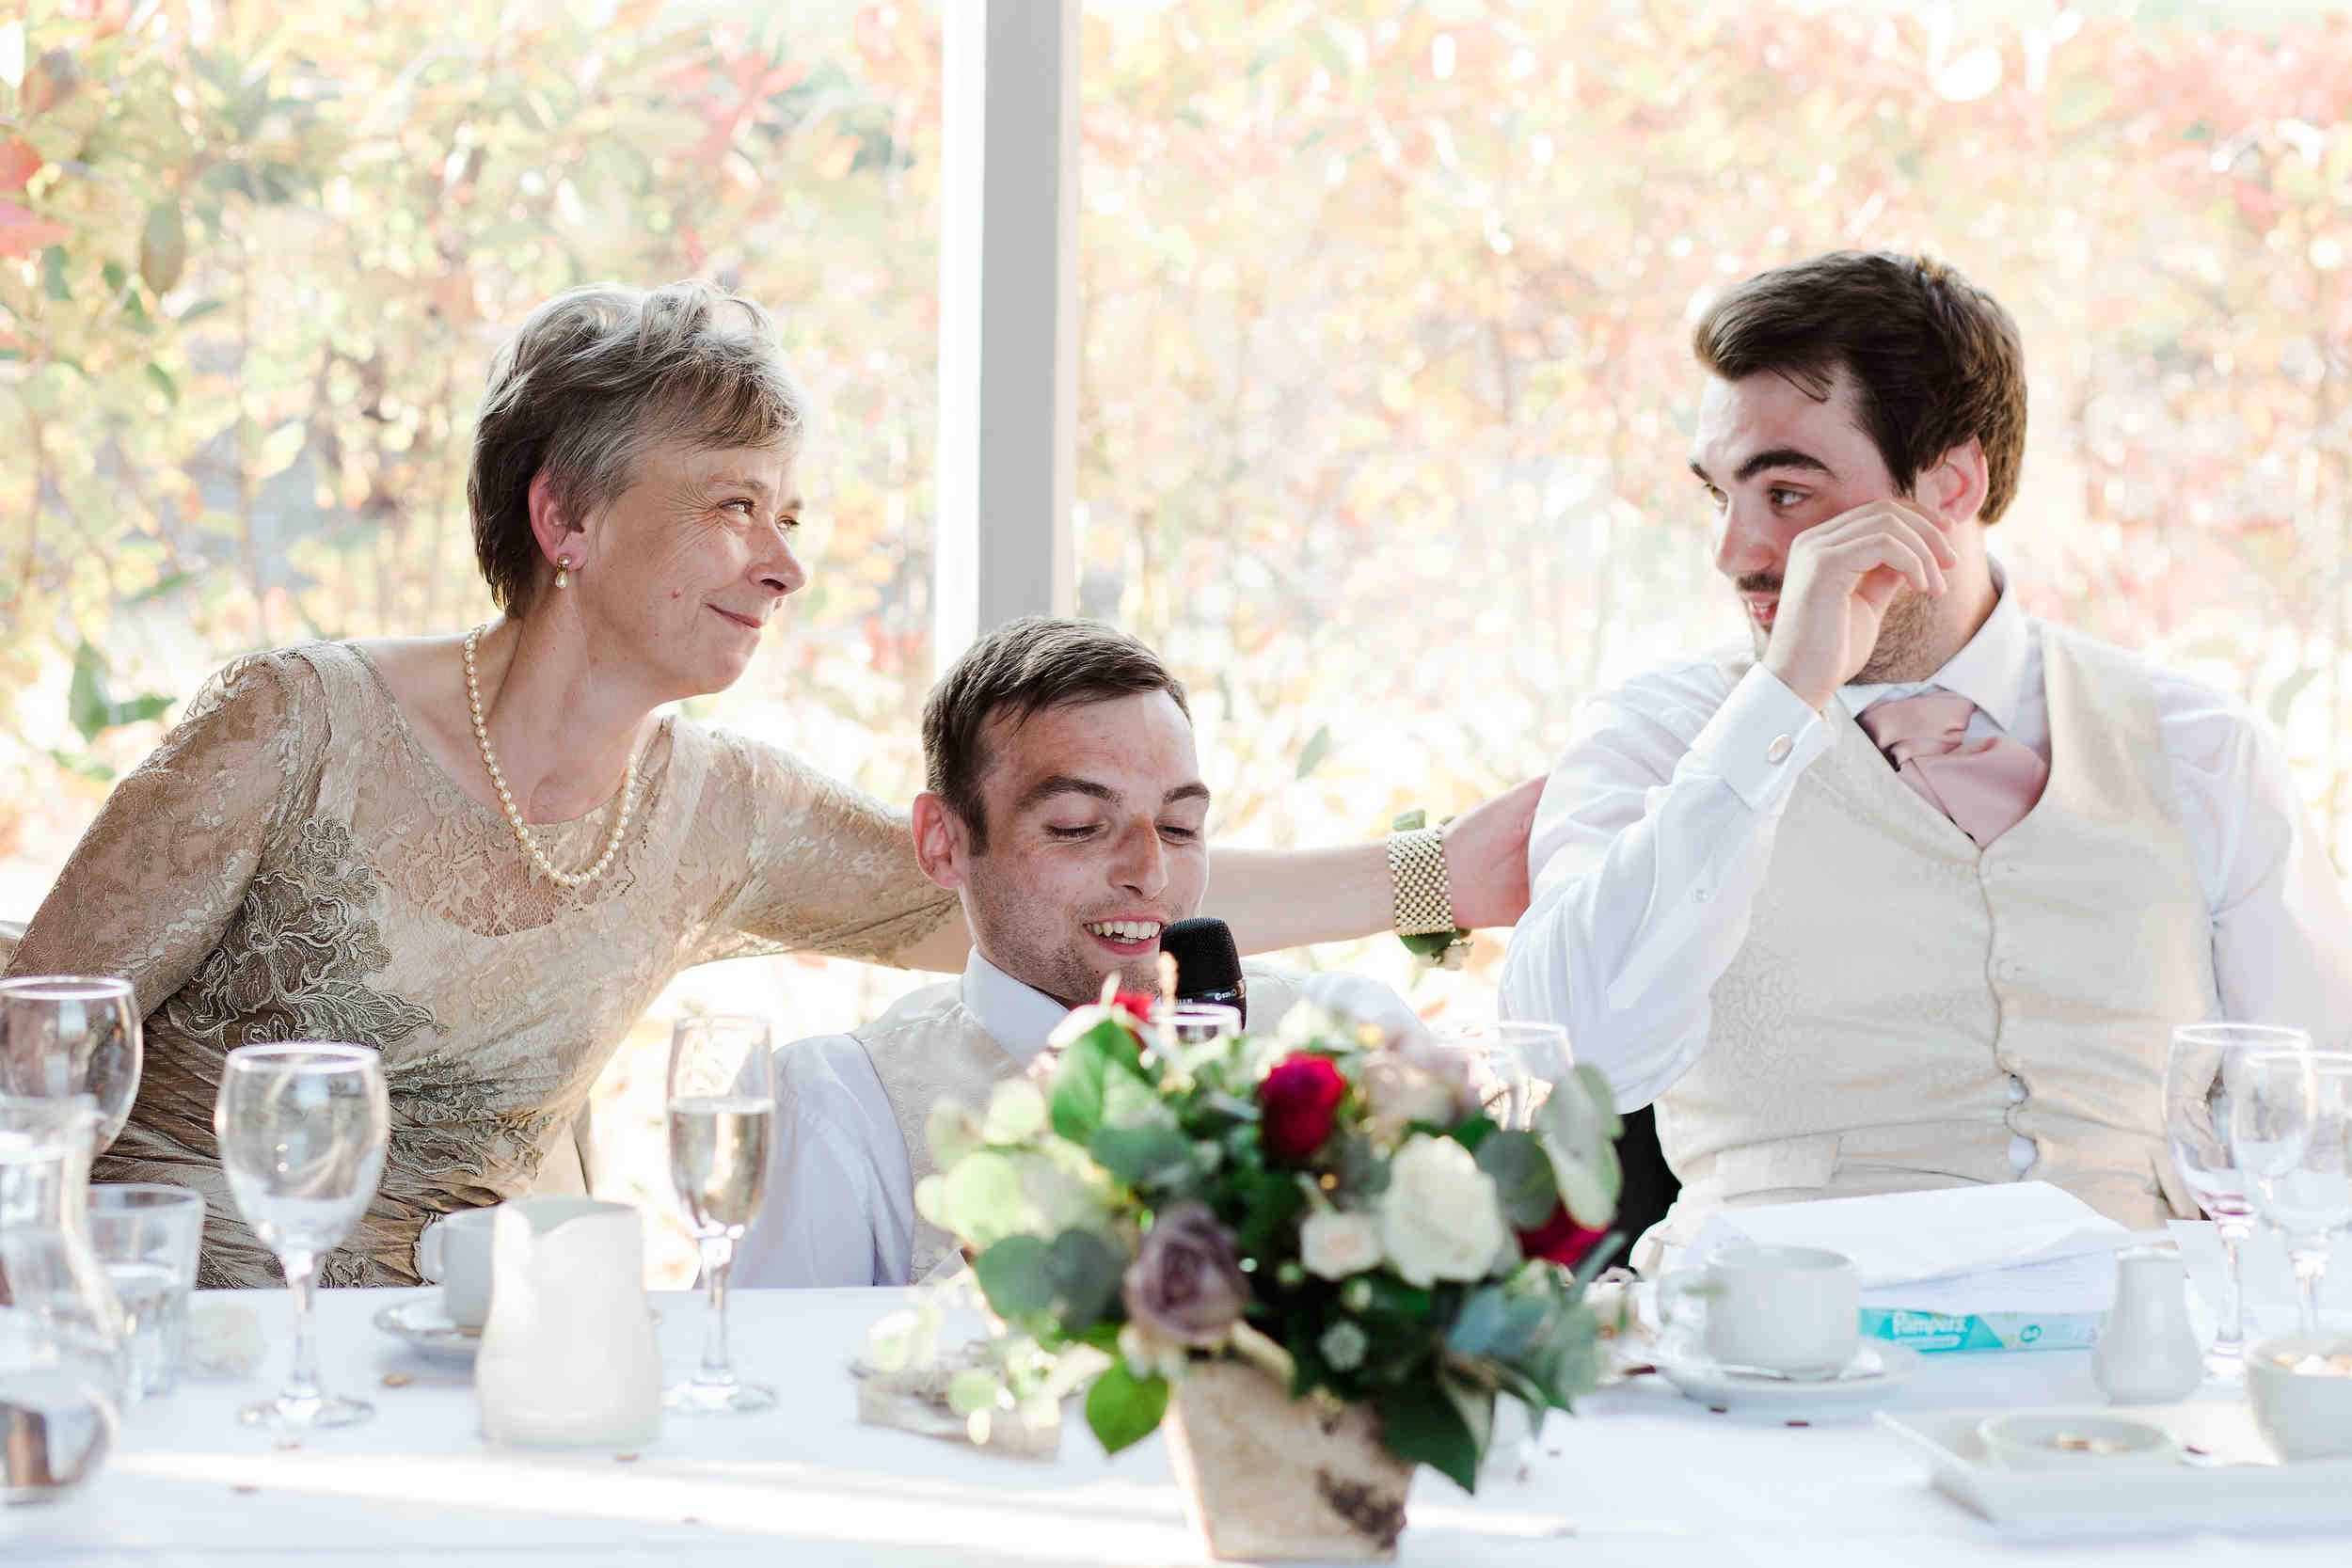 Modern_Stylish_Wedding_at_Swallows_Nest_Barn1256